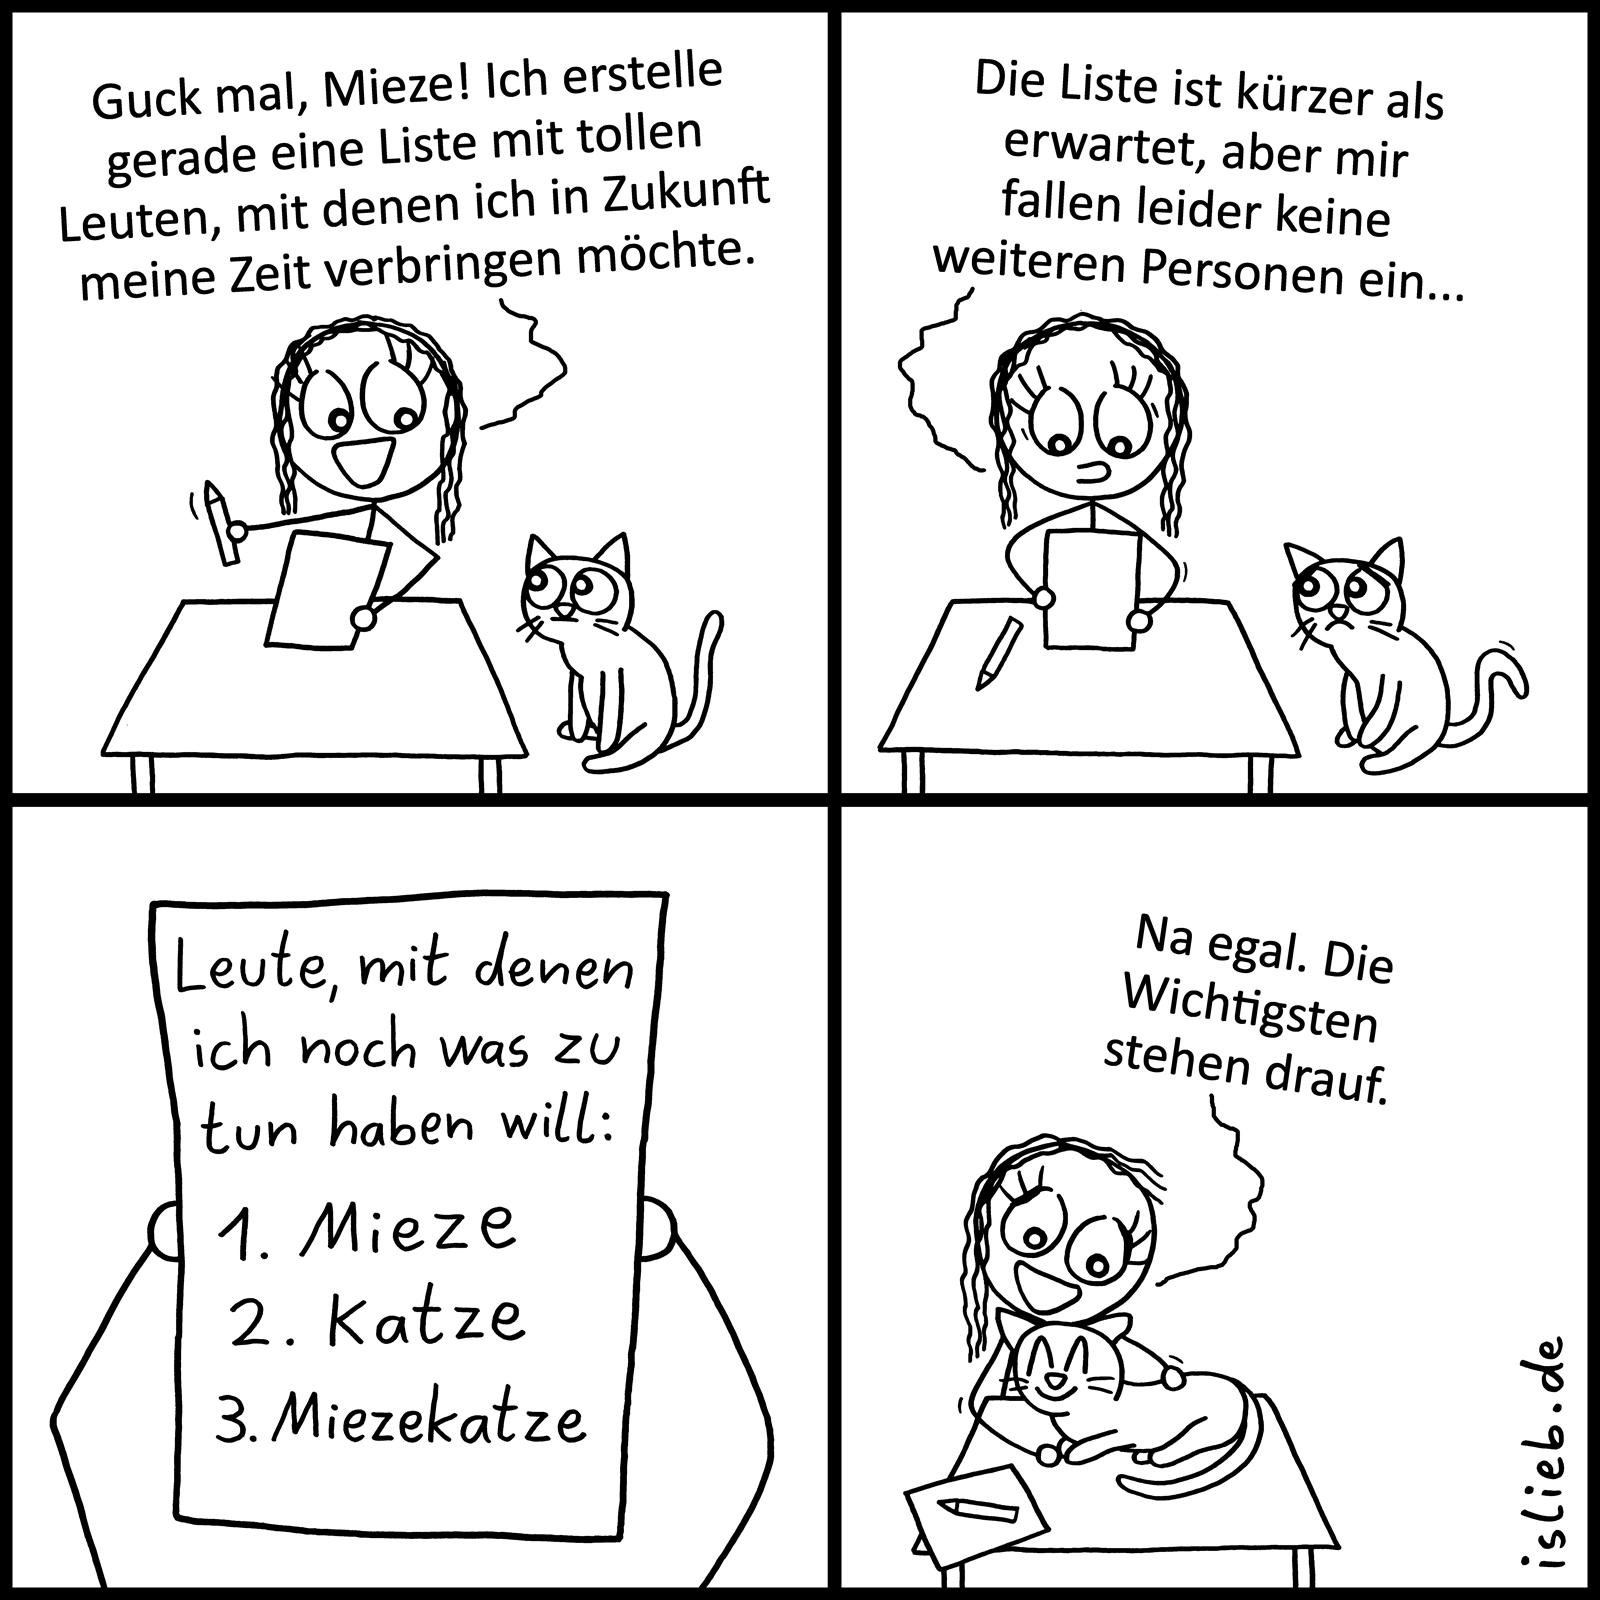 Great people list. Is nice | #katze #mieze #katzenliebe #kitty #cats -  Great people list. Is nice | #cat #babe #cat love #kitty #cats   - #cats #great #Katze #katzenliebe #kidtattoos #kitty #List #mieze #mommytattoos #nametattoos #nice #people